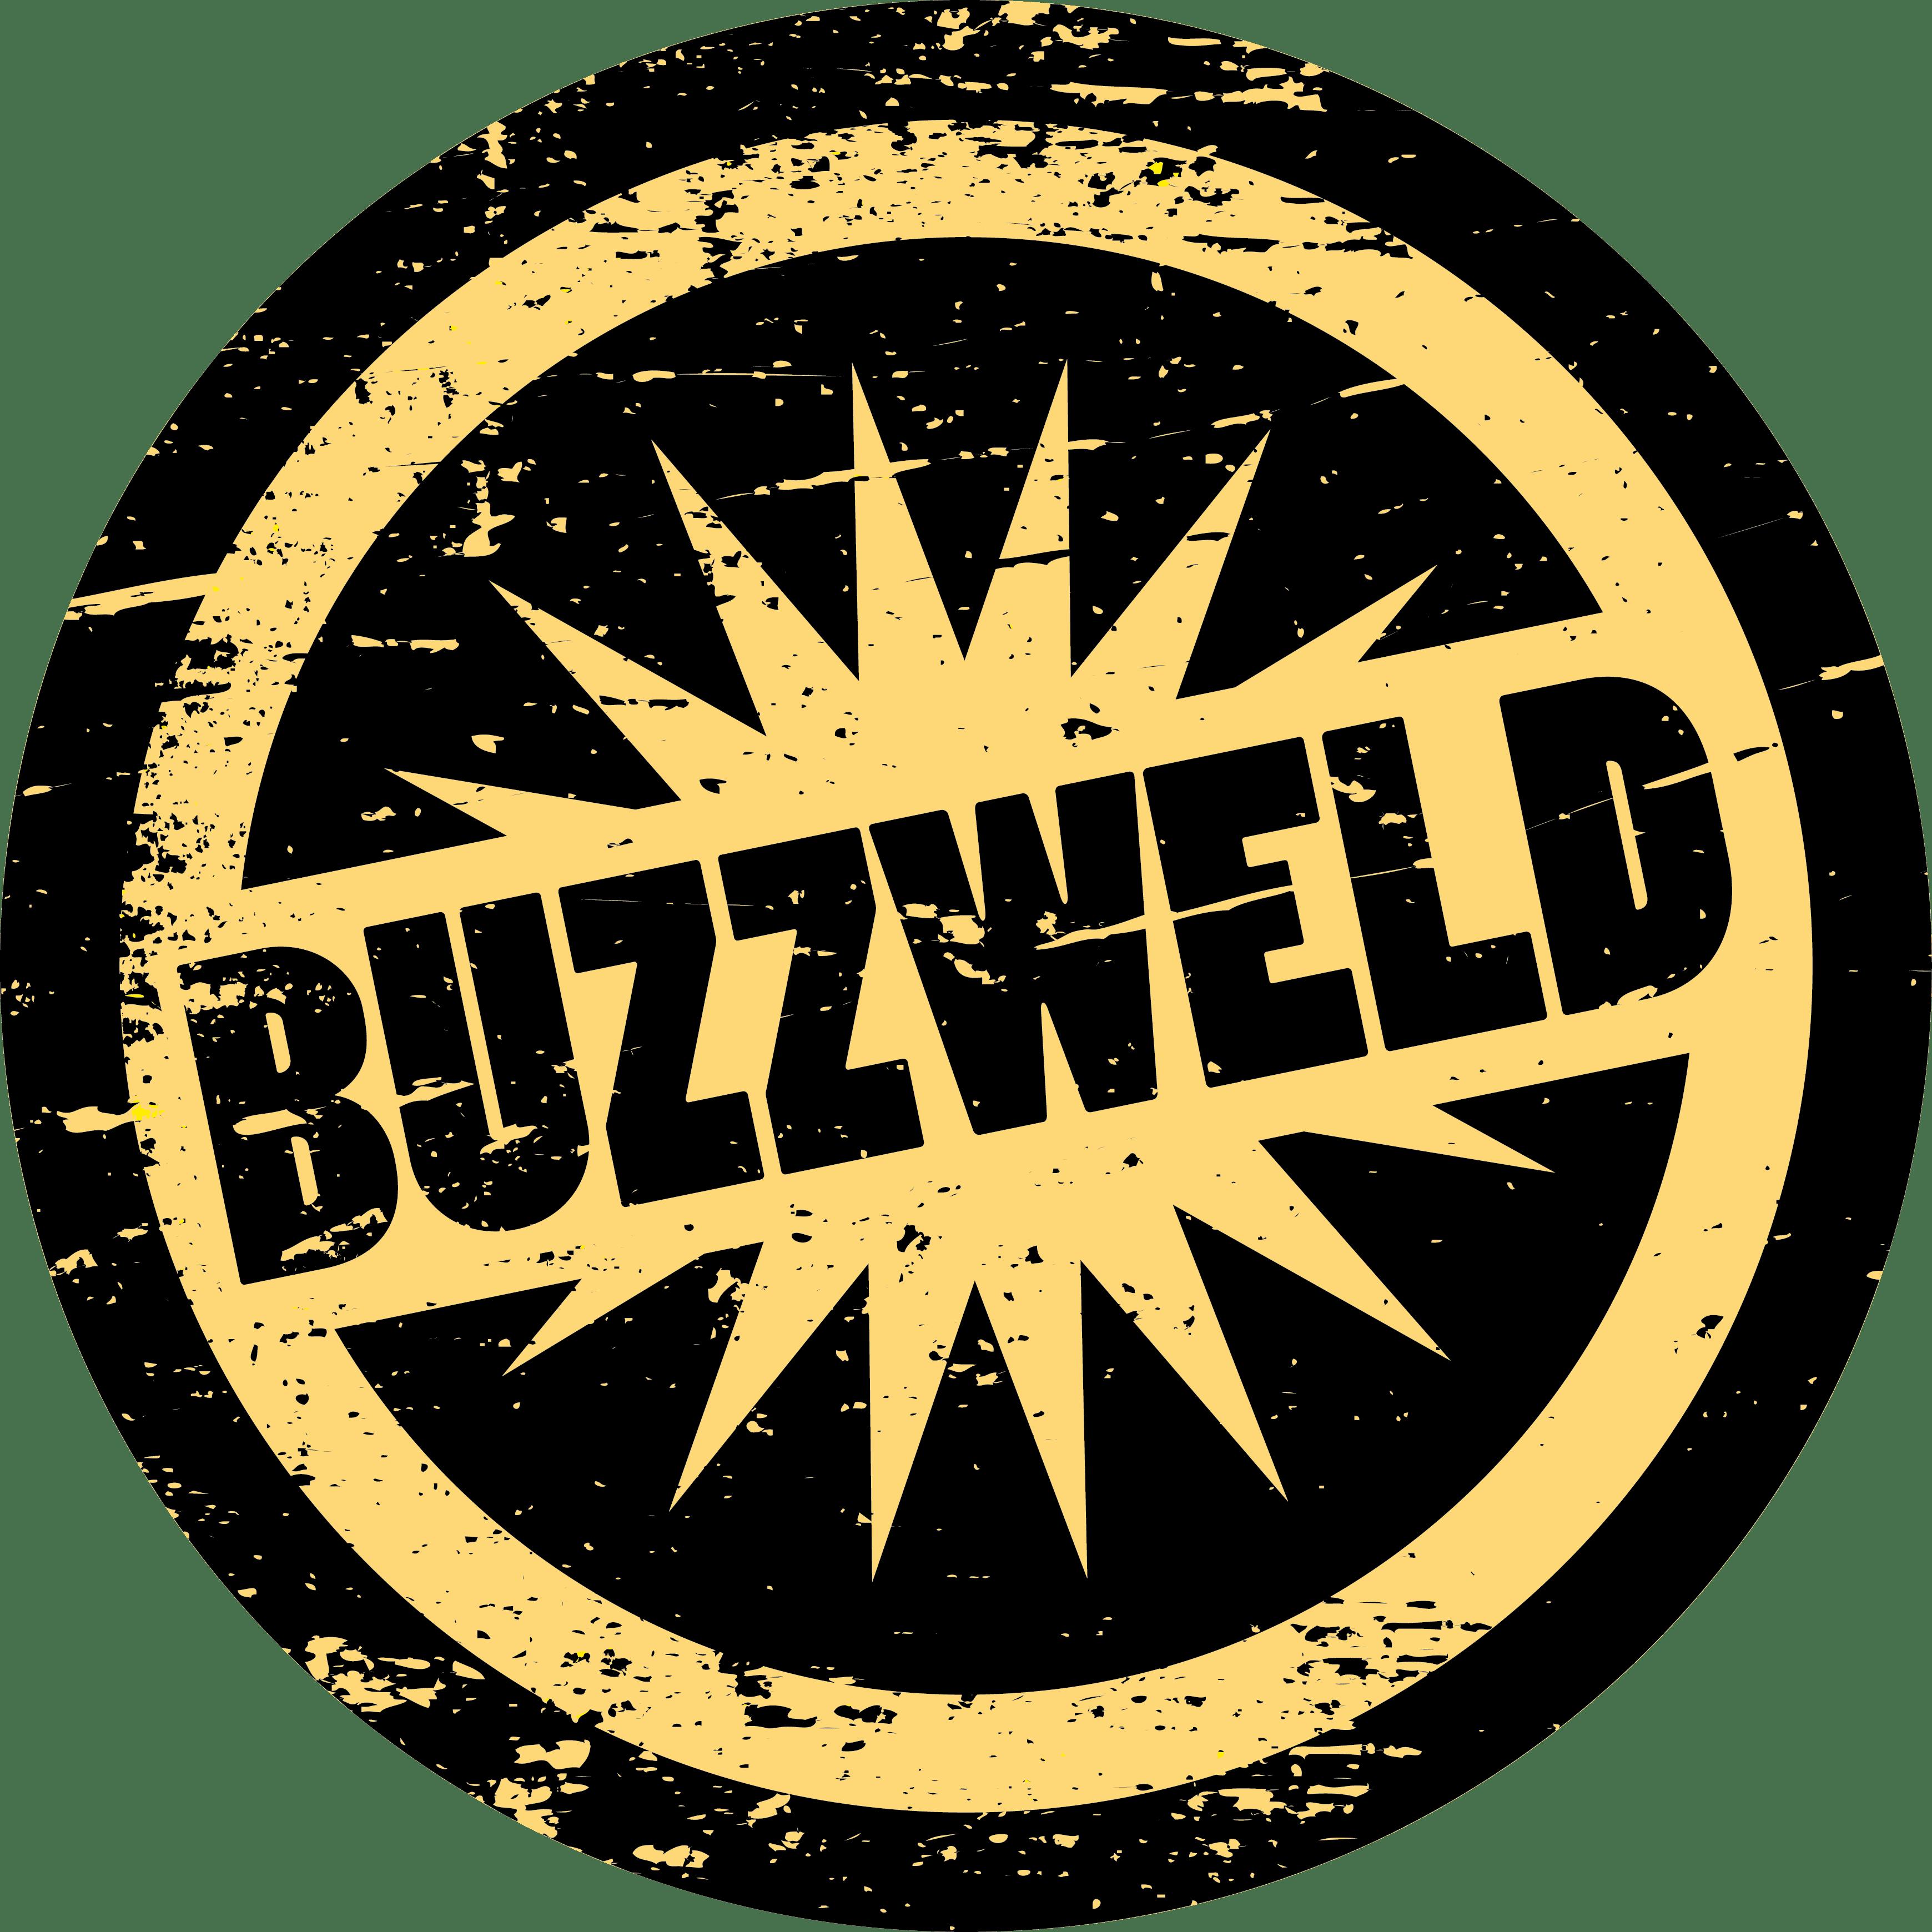 Buzzweld